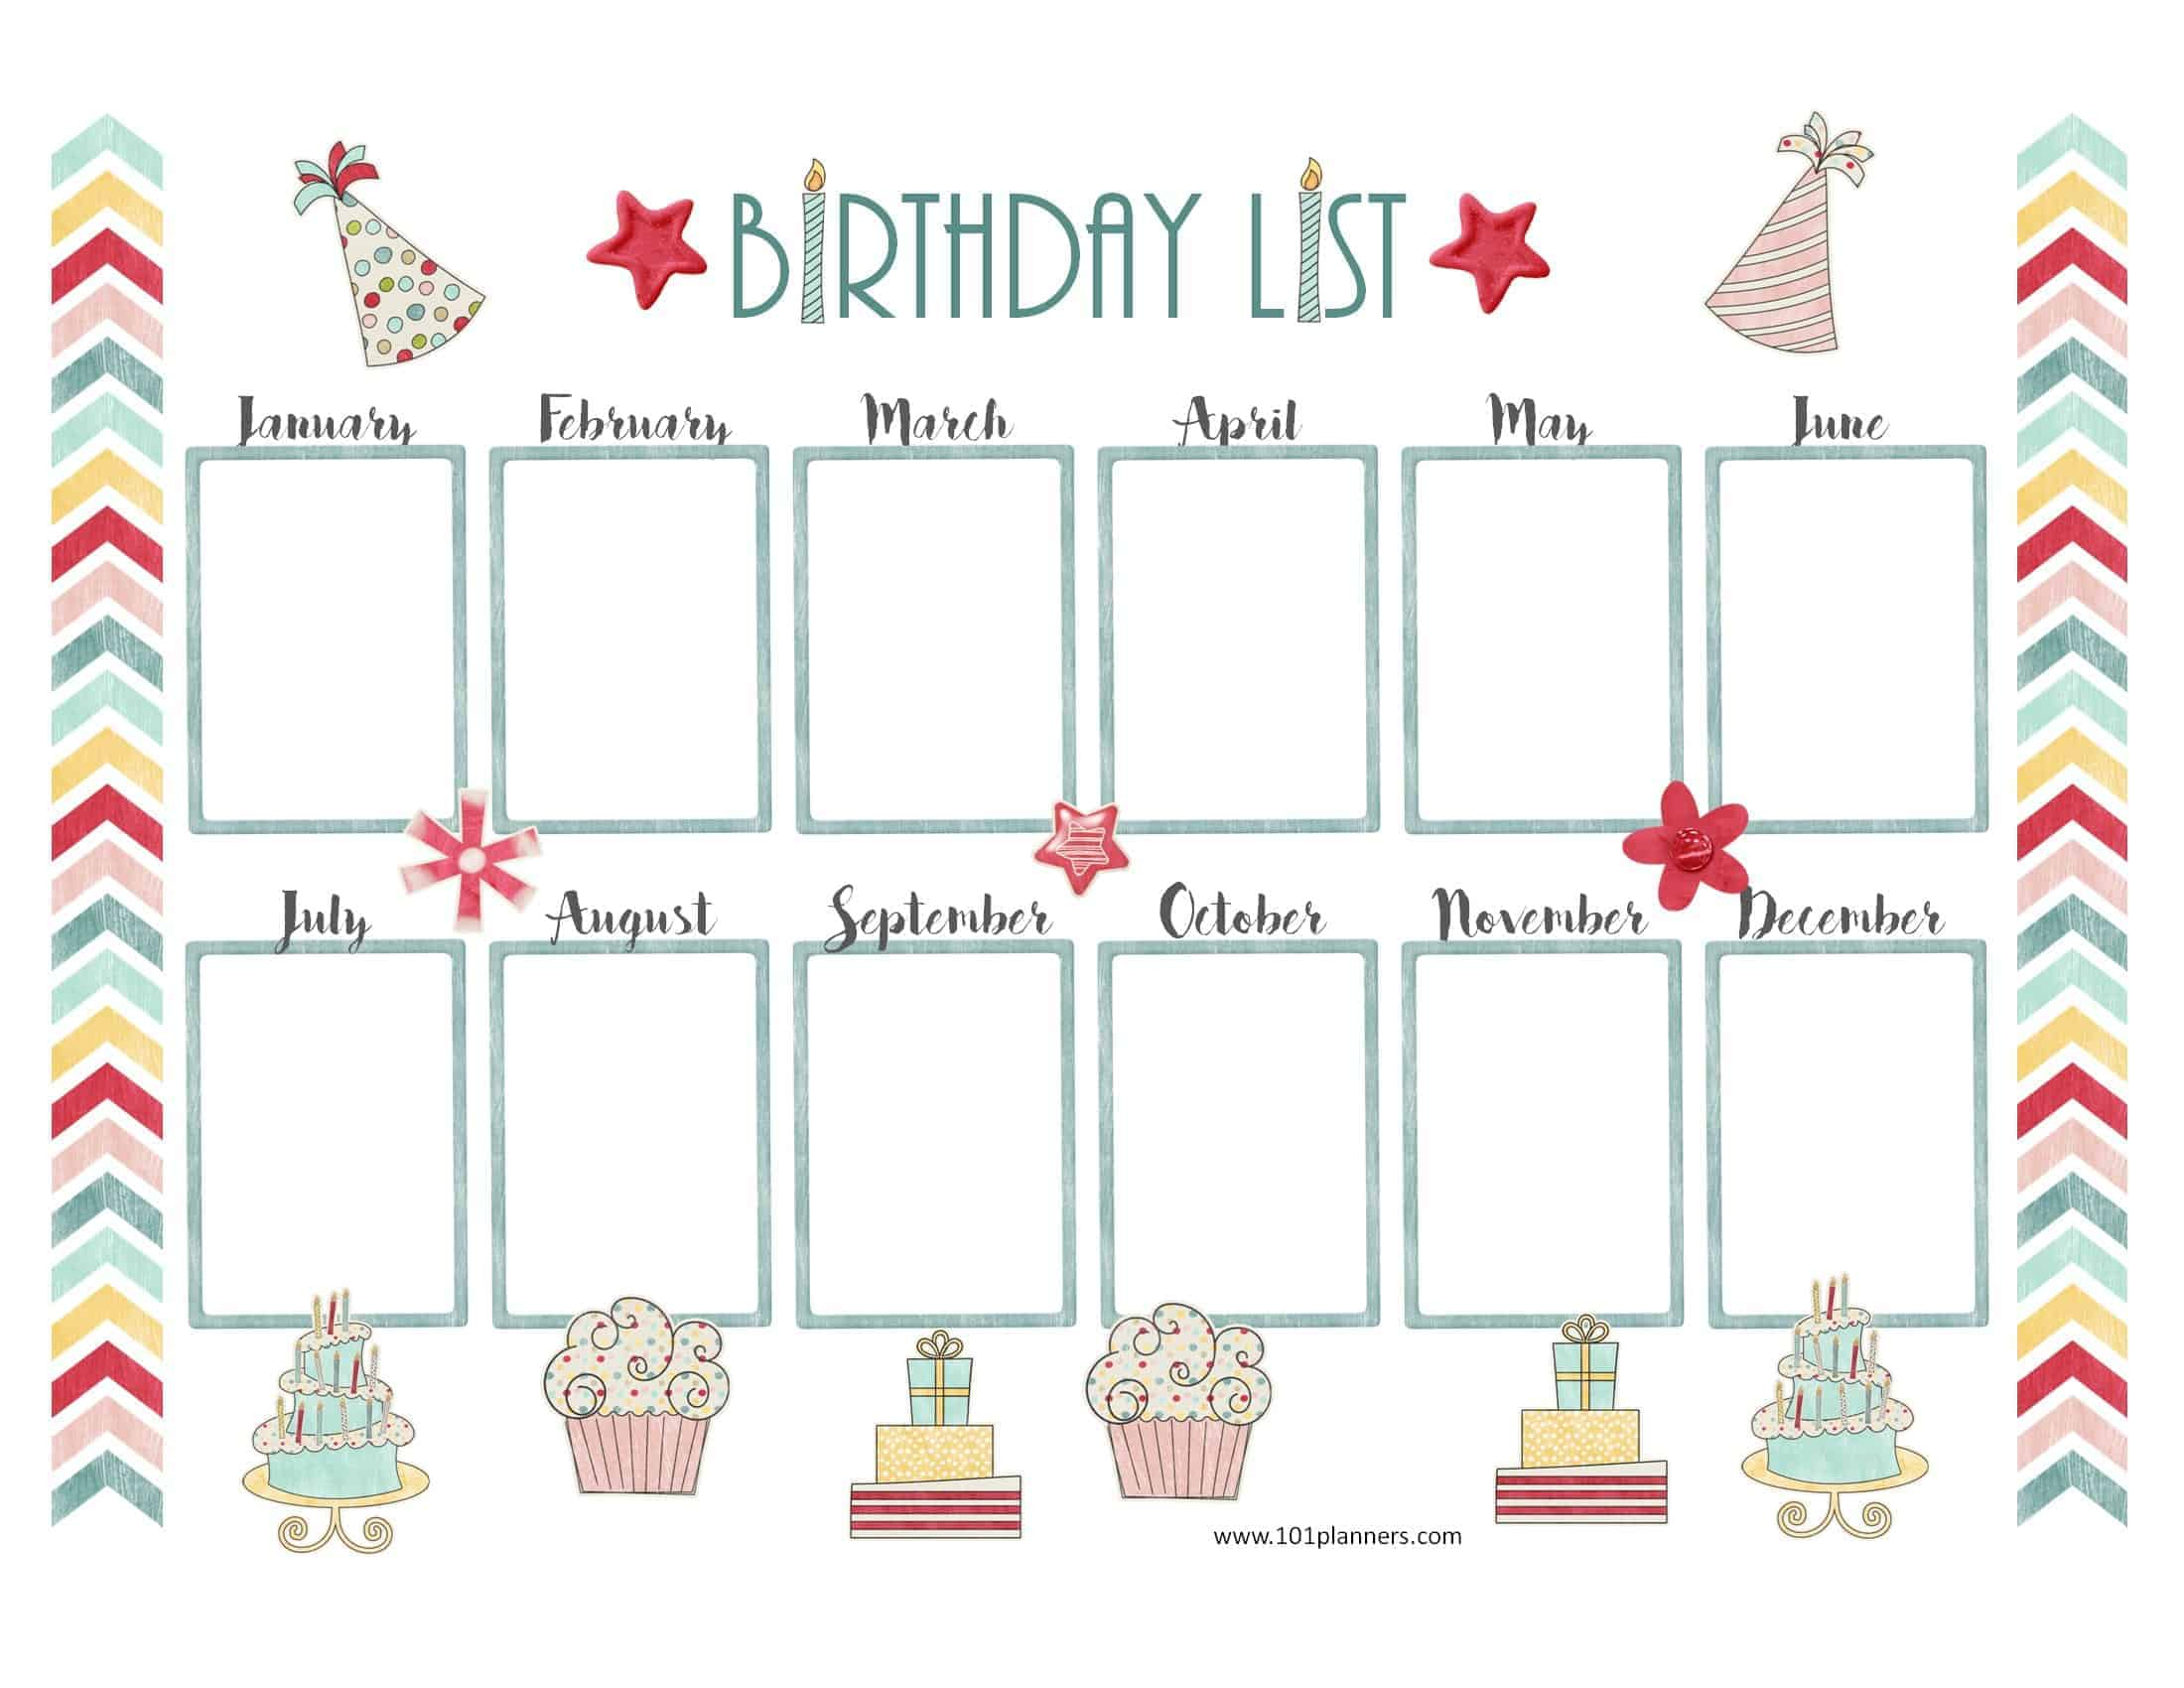 Happy Birthday Calendar Printables  Yatay.horizonconsulting.co regarding Classroom Birthday Calendar Template